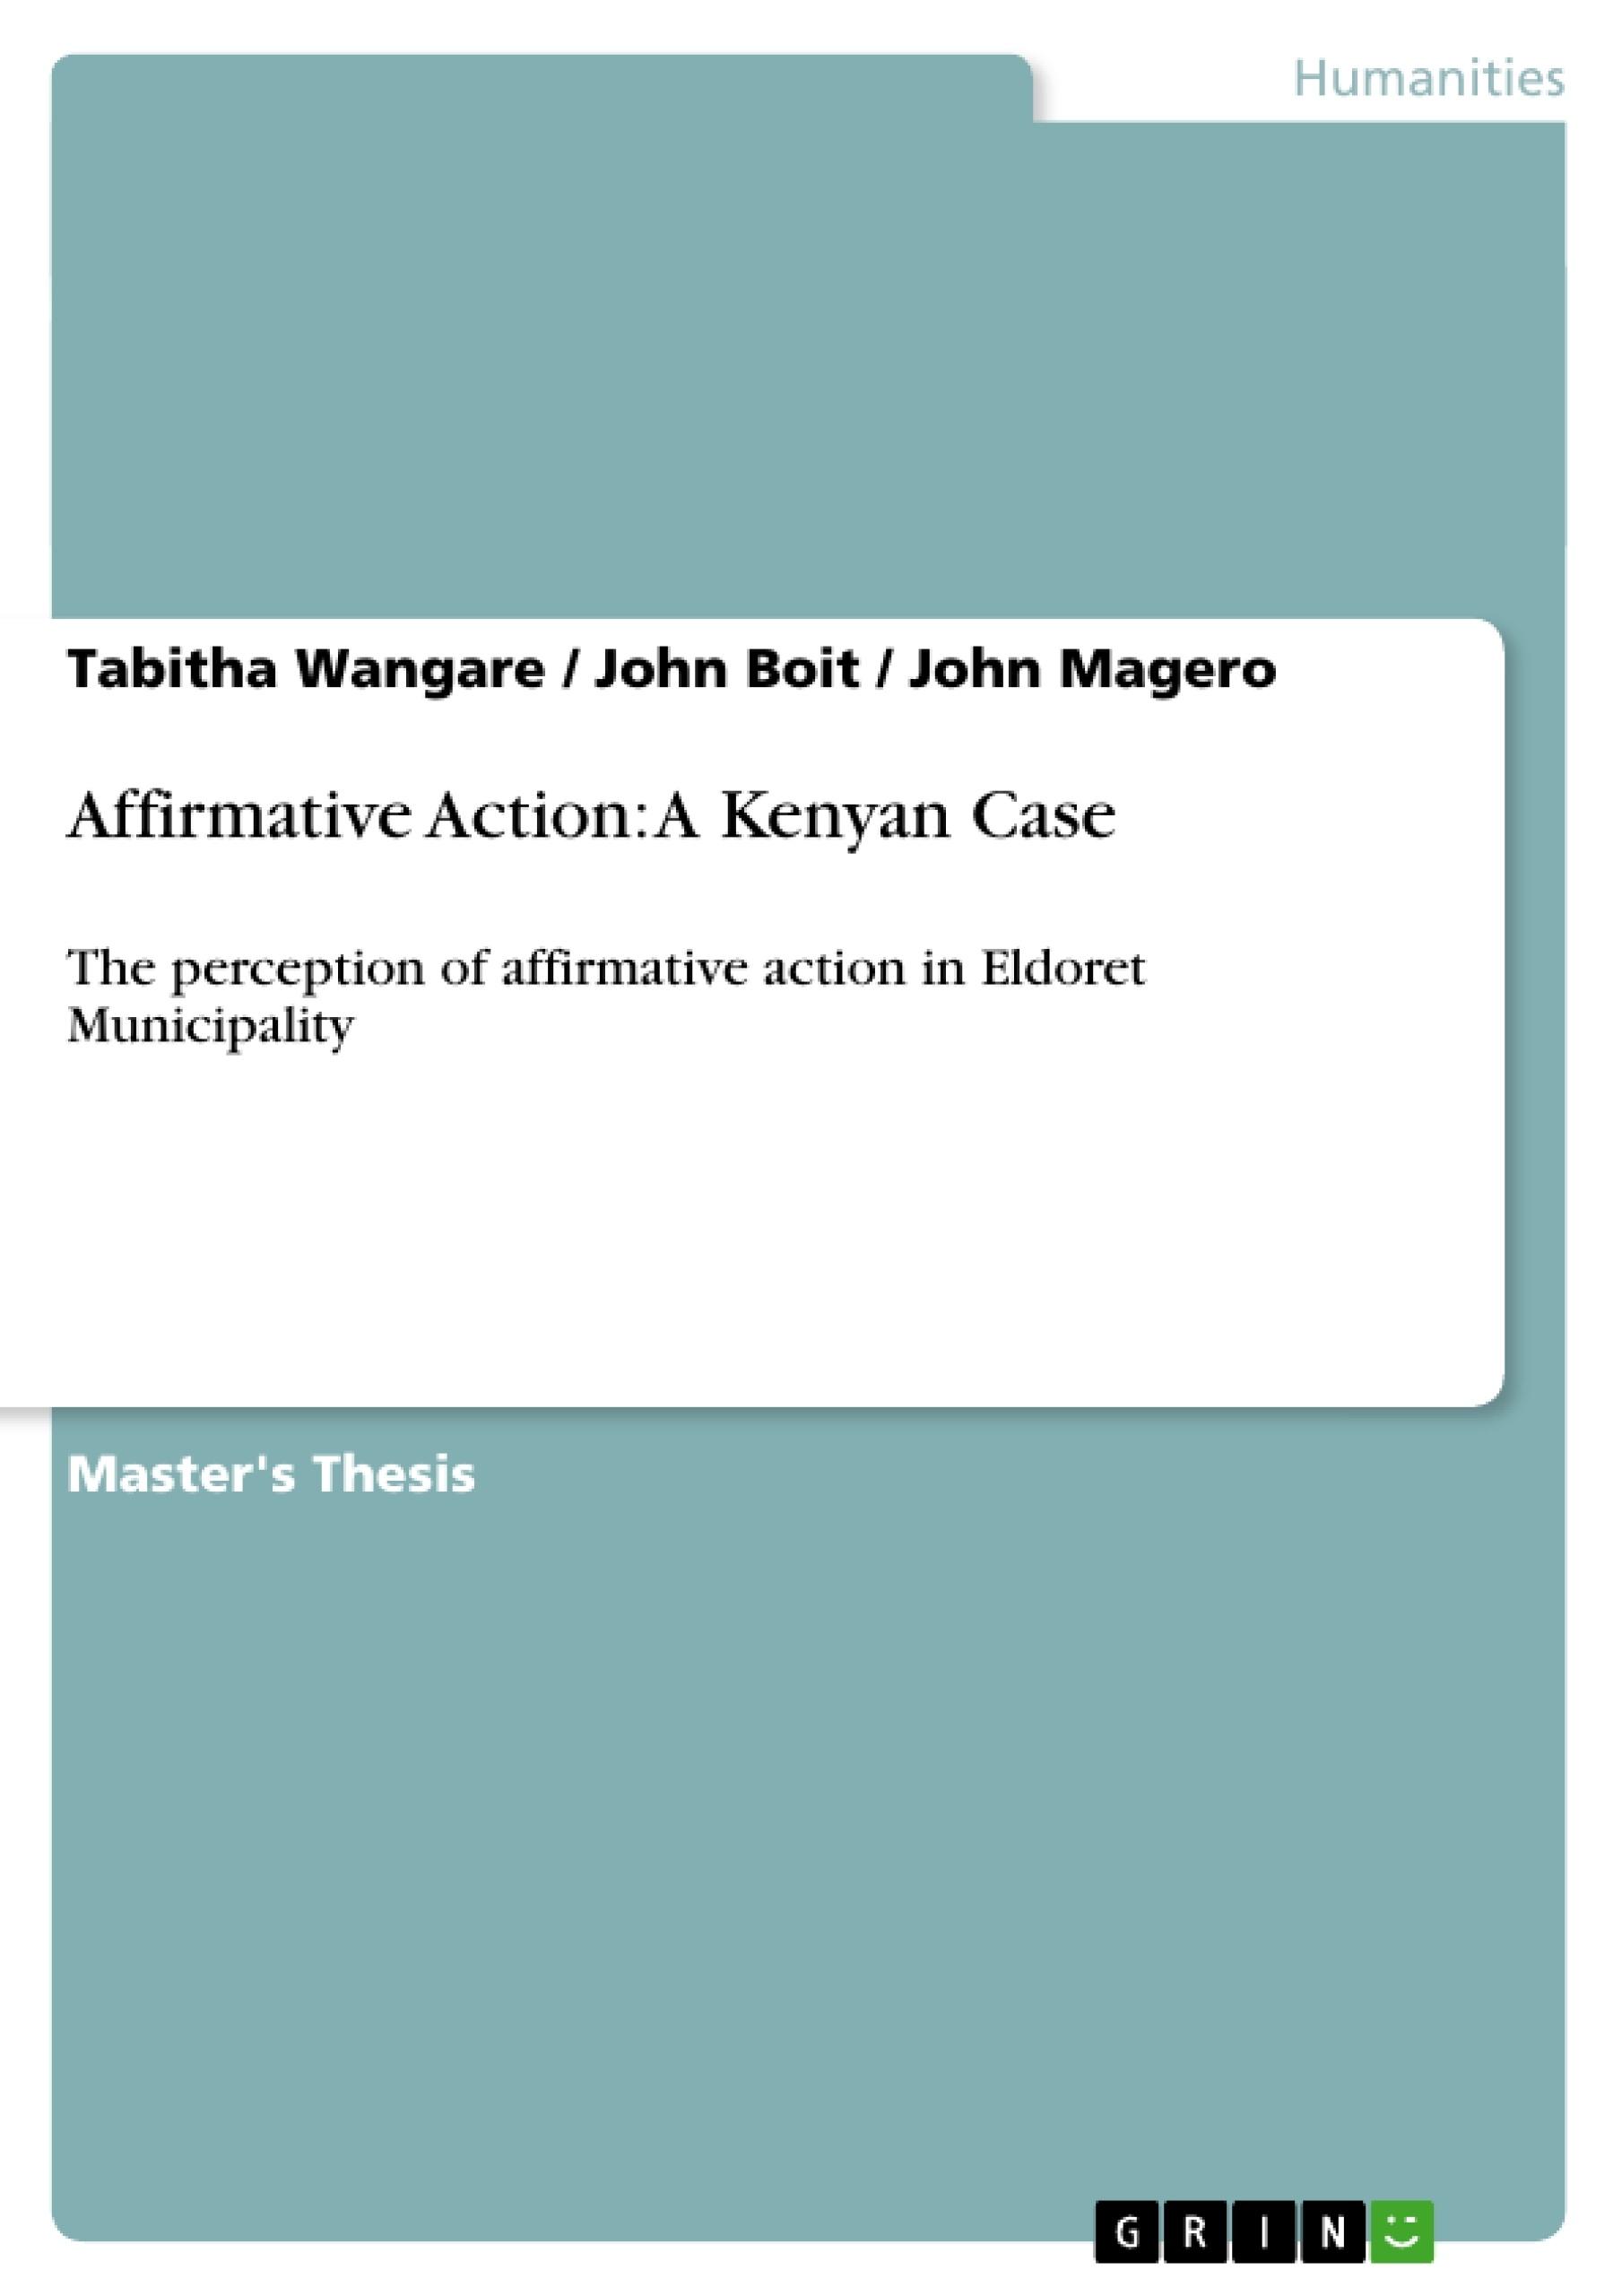 Title: Affirmative Action: A Kenyan Case